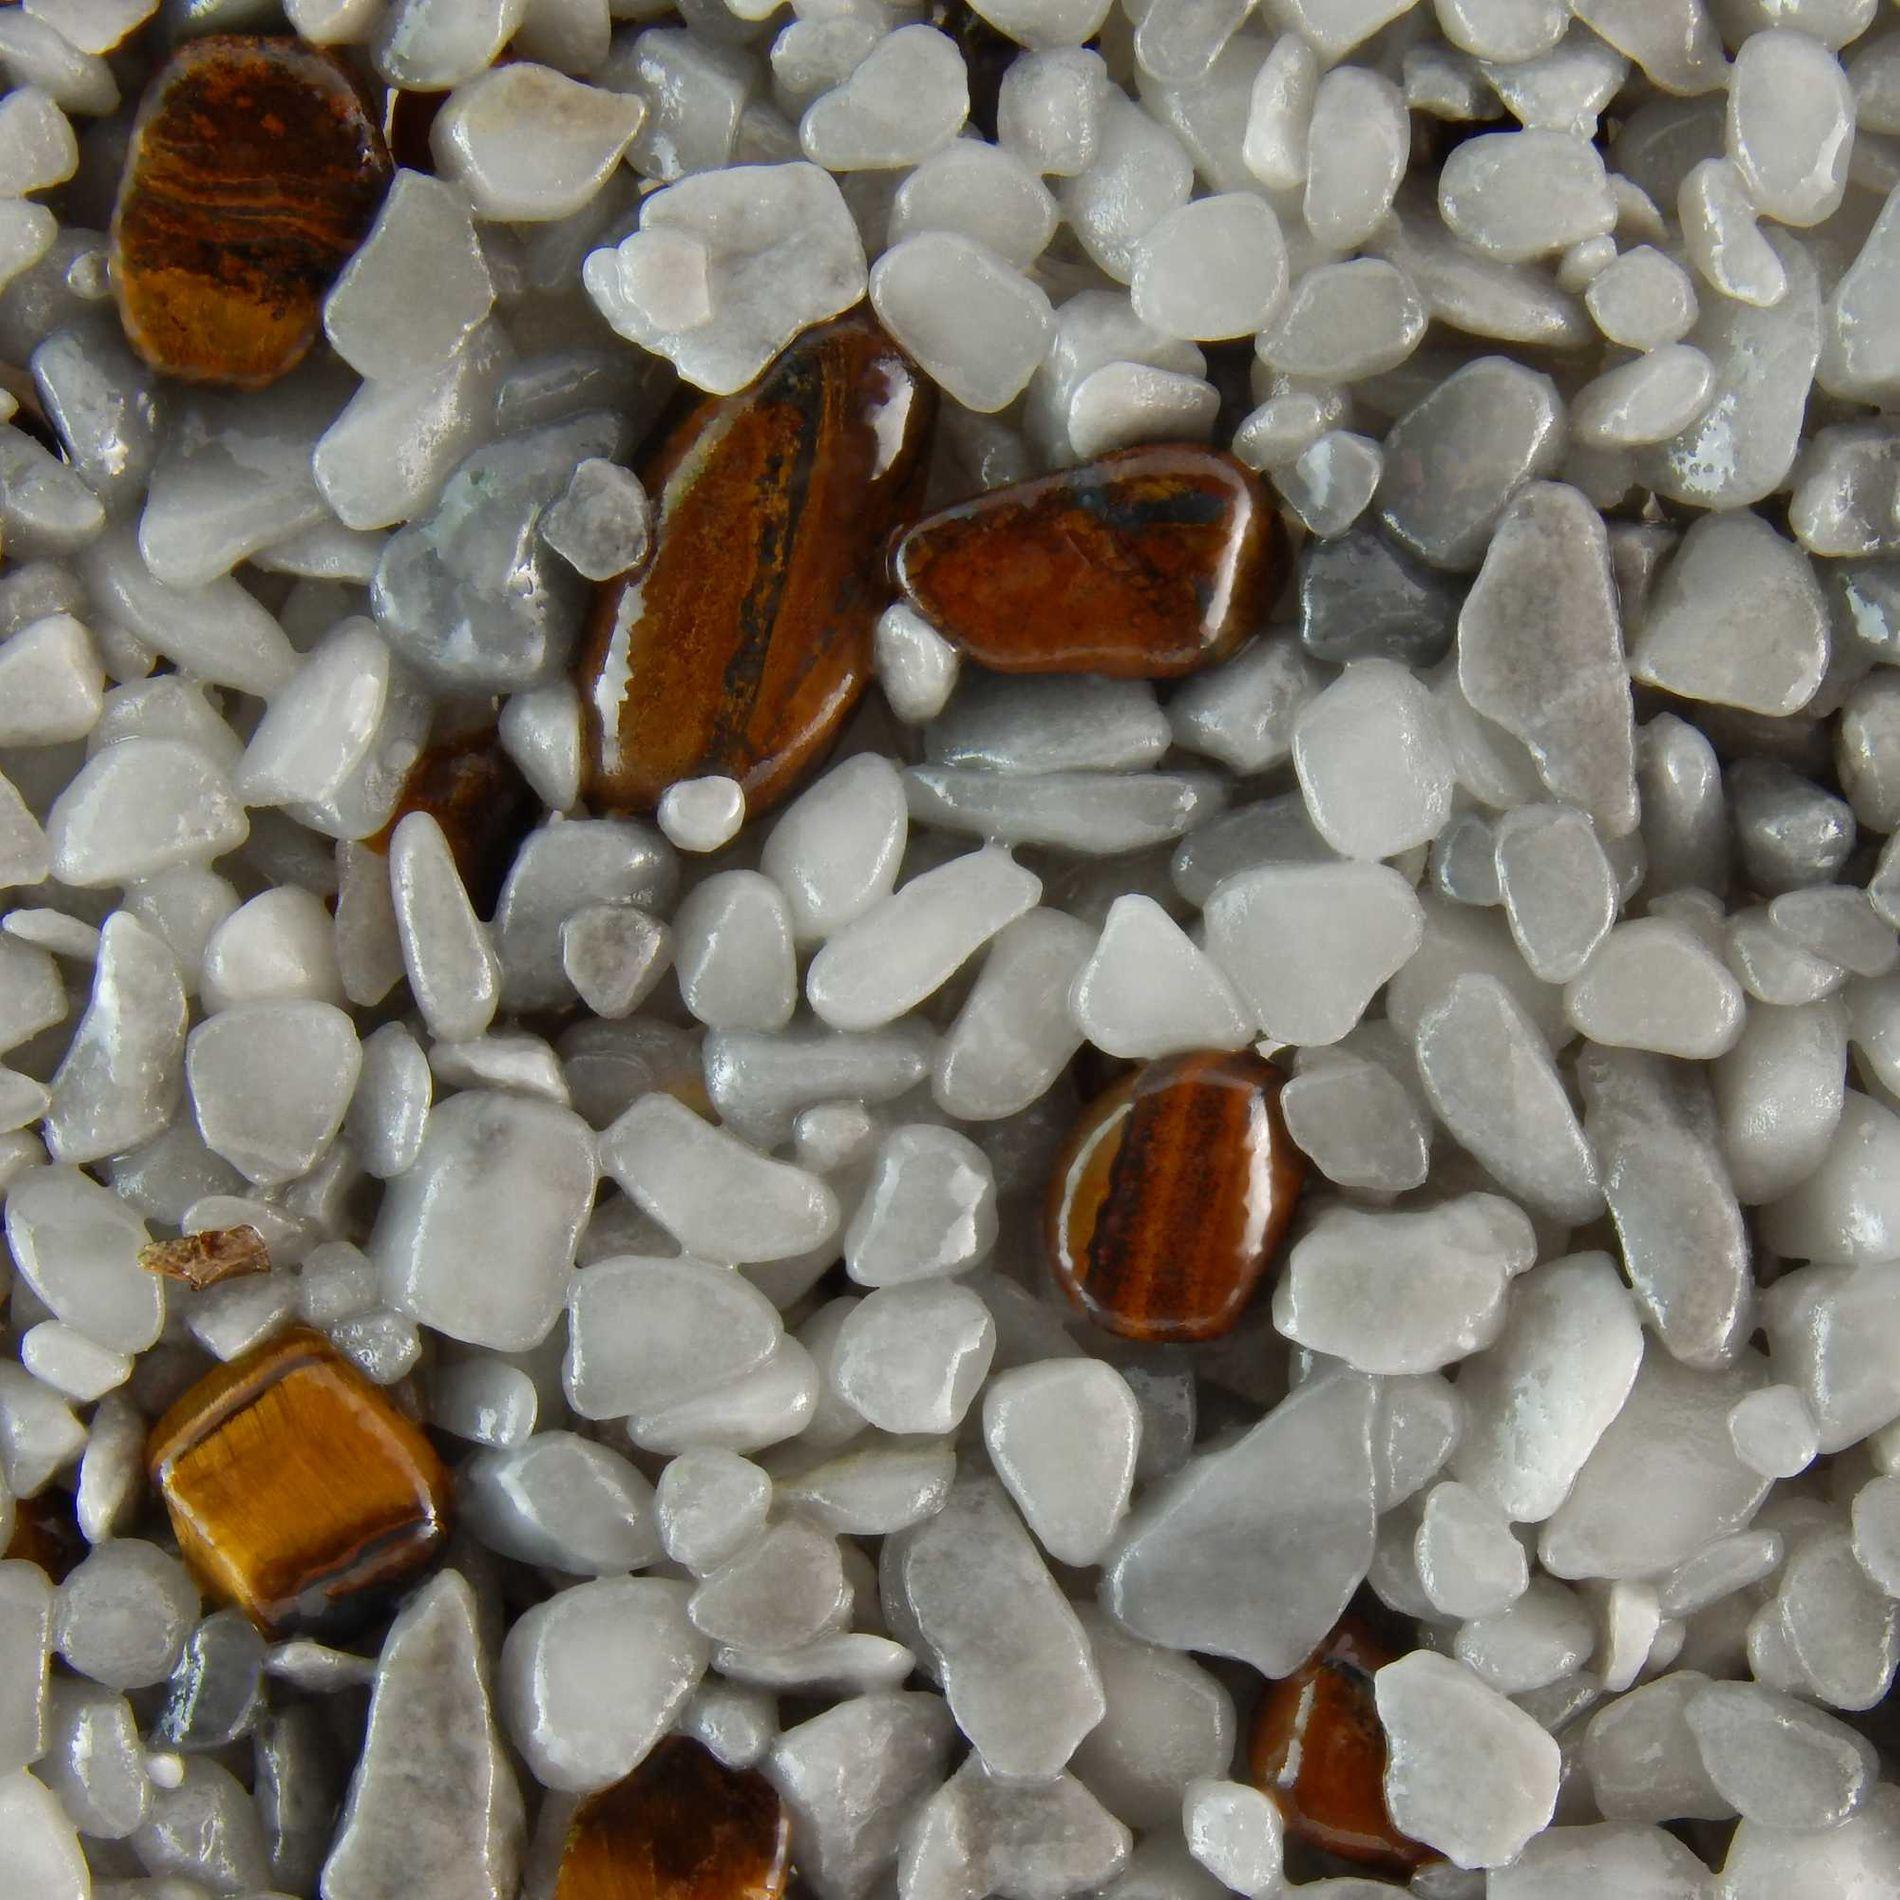 Terralith Edelsteinteppich Mix Tigerauge / Grau 1 qm -innen-